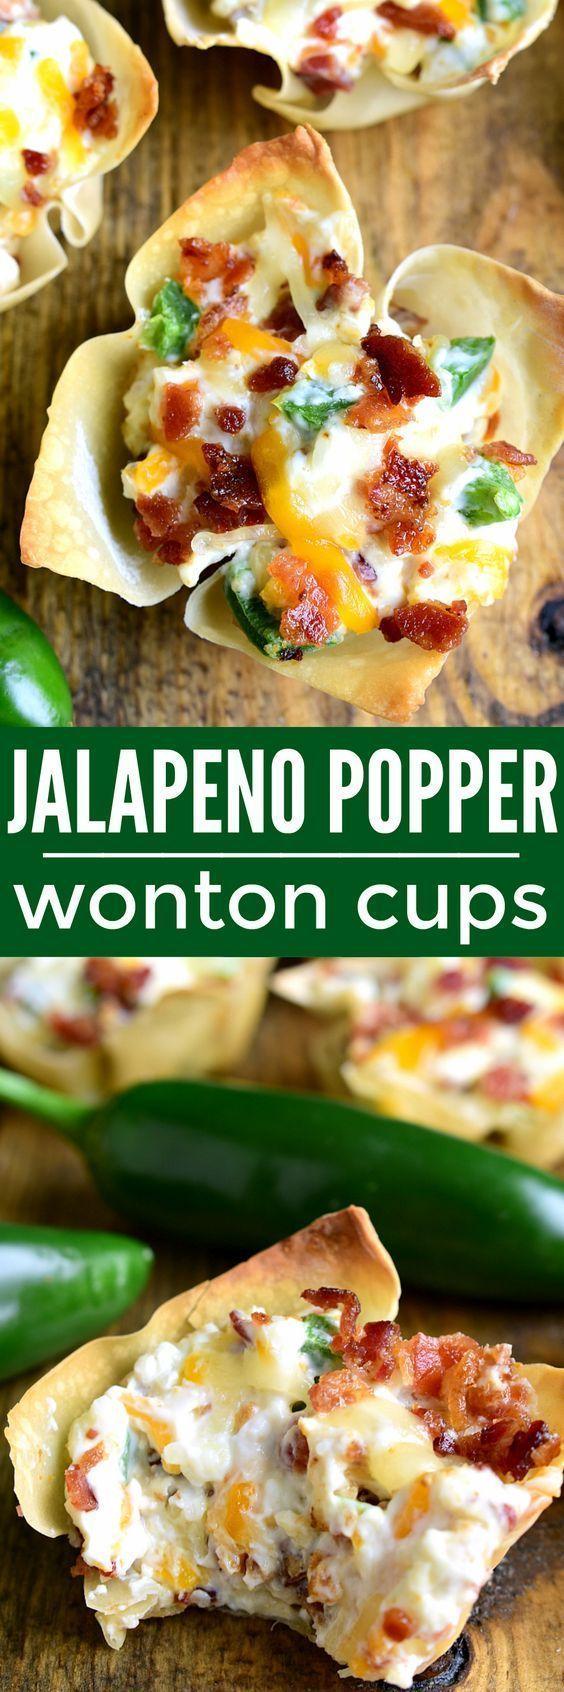 Jalapeno Popper Wonton Cups   Recipe